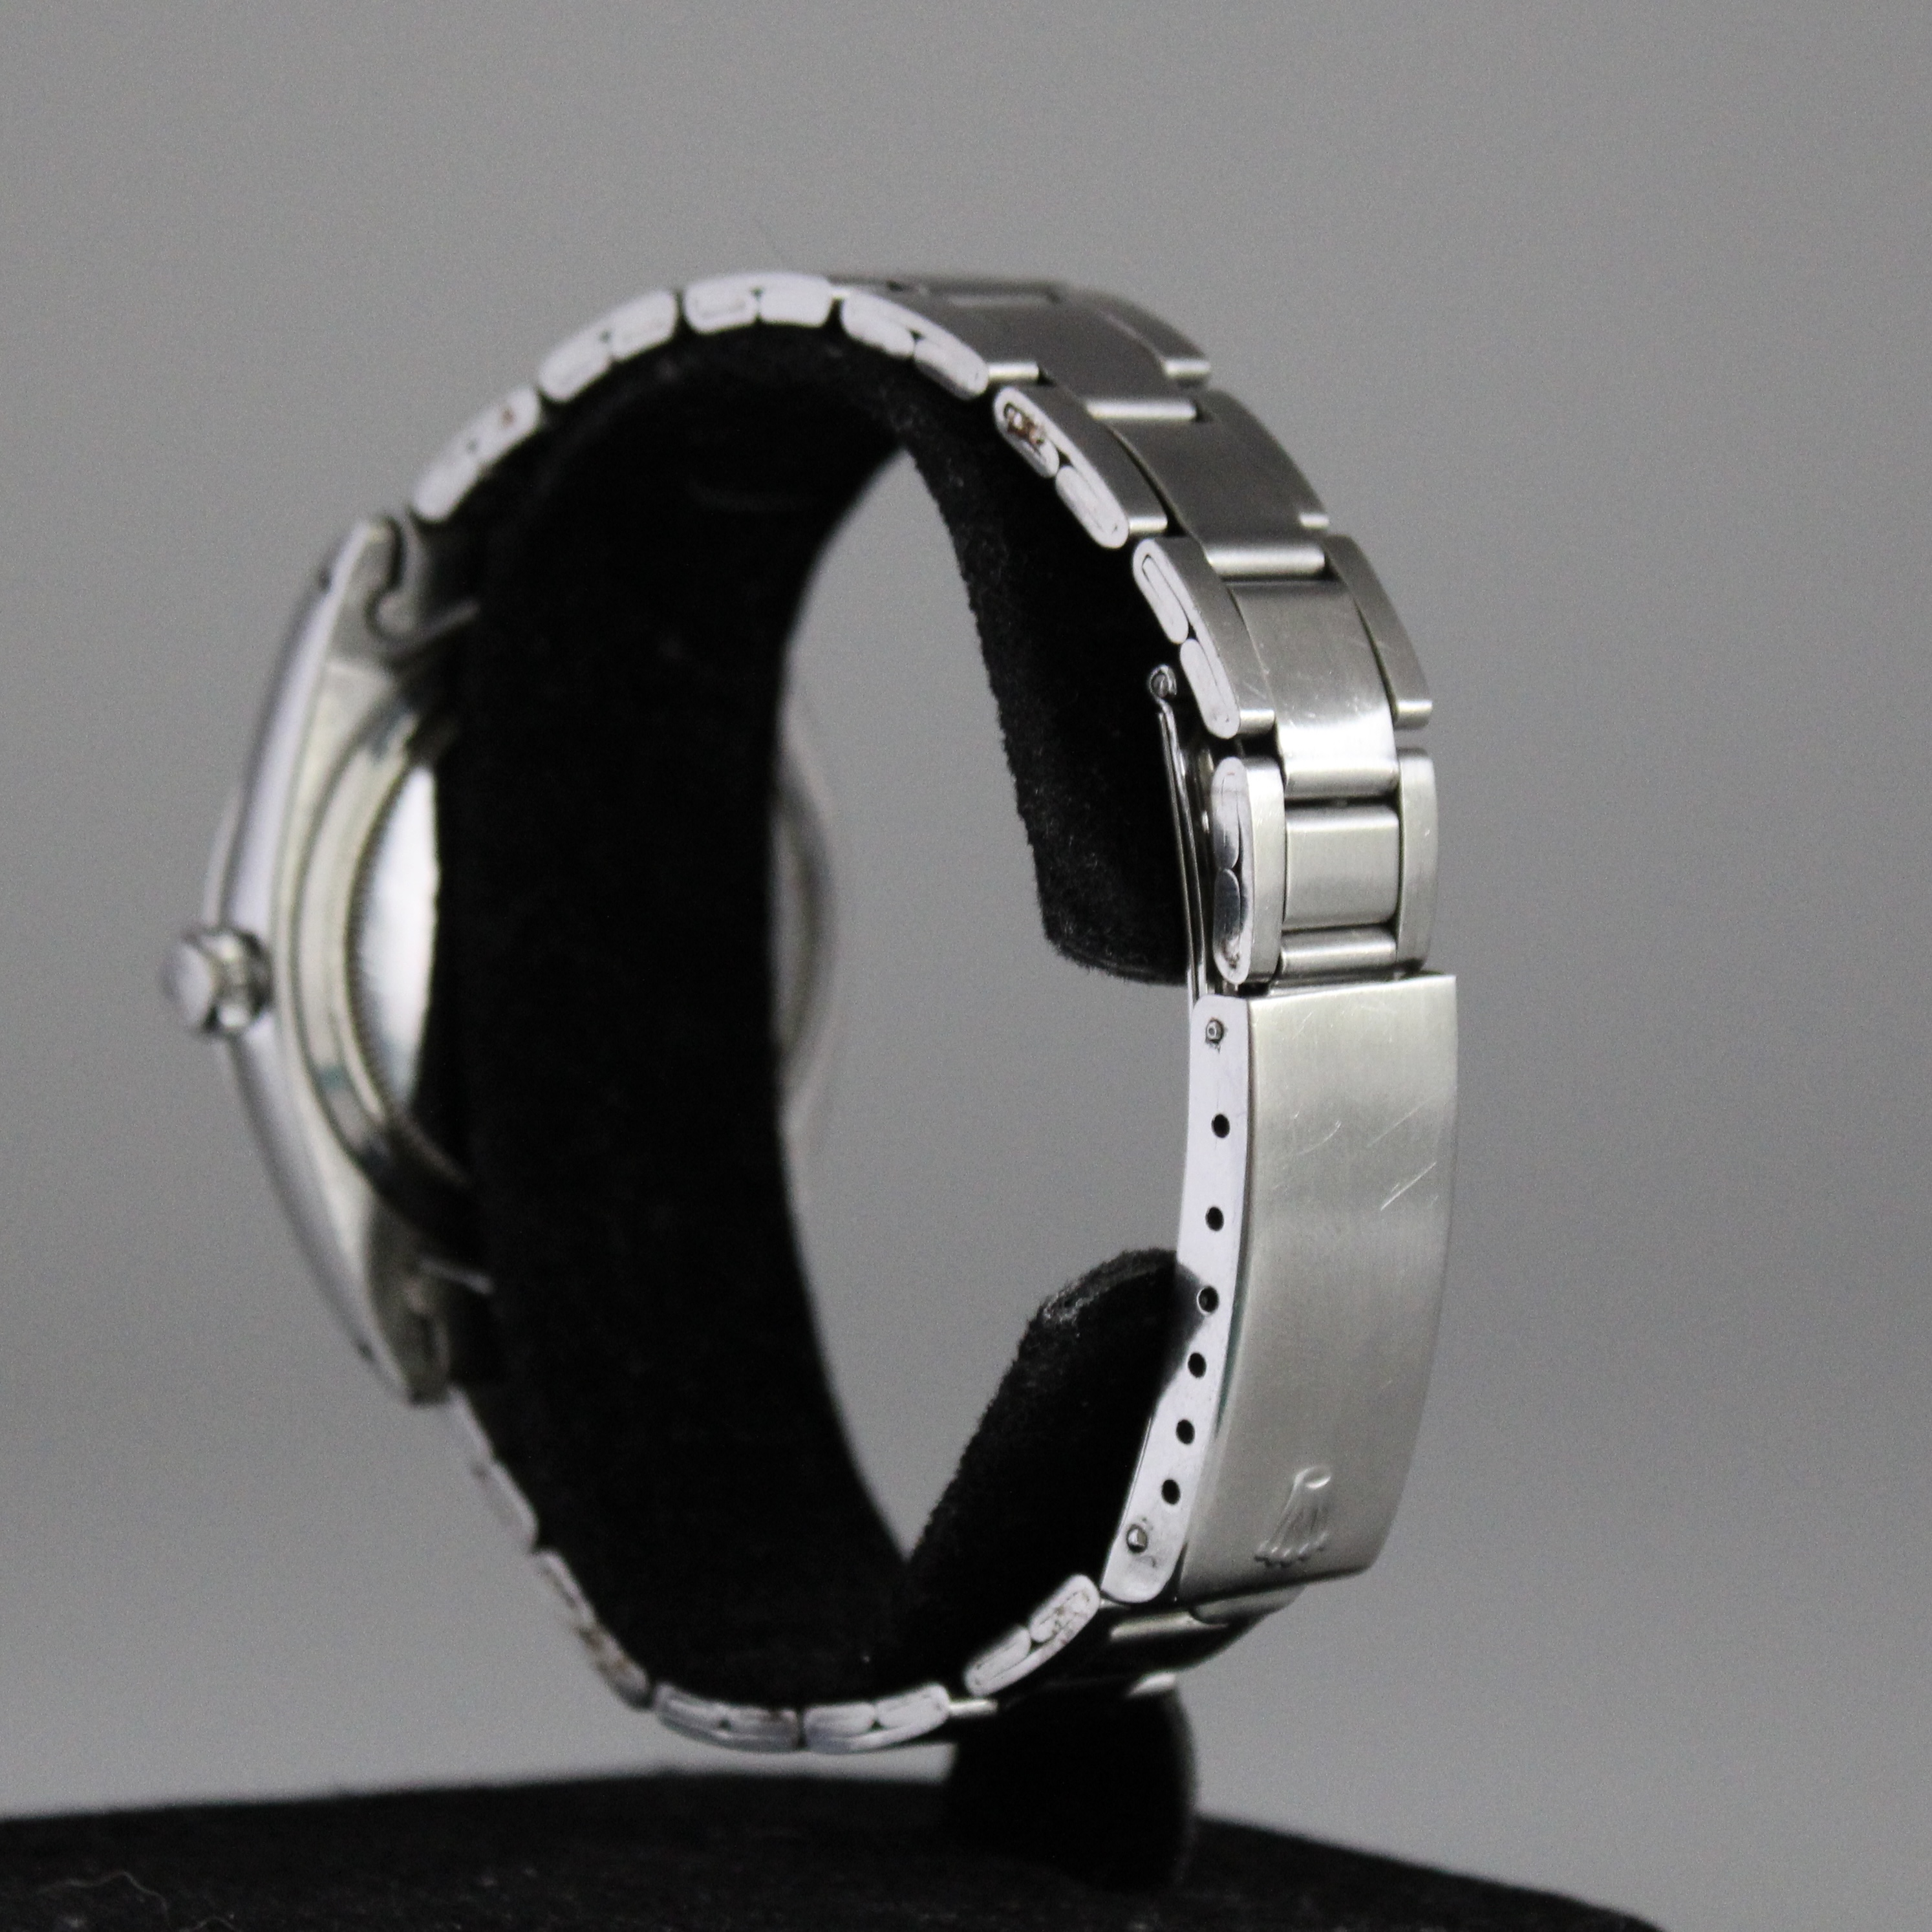 Rolex Oysterdate Precision ref 6694 - Image 5 of 6